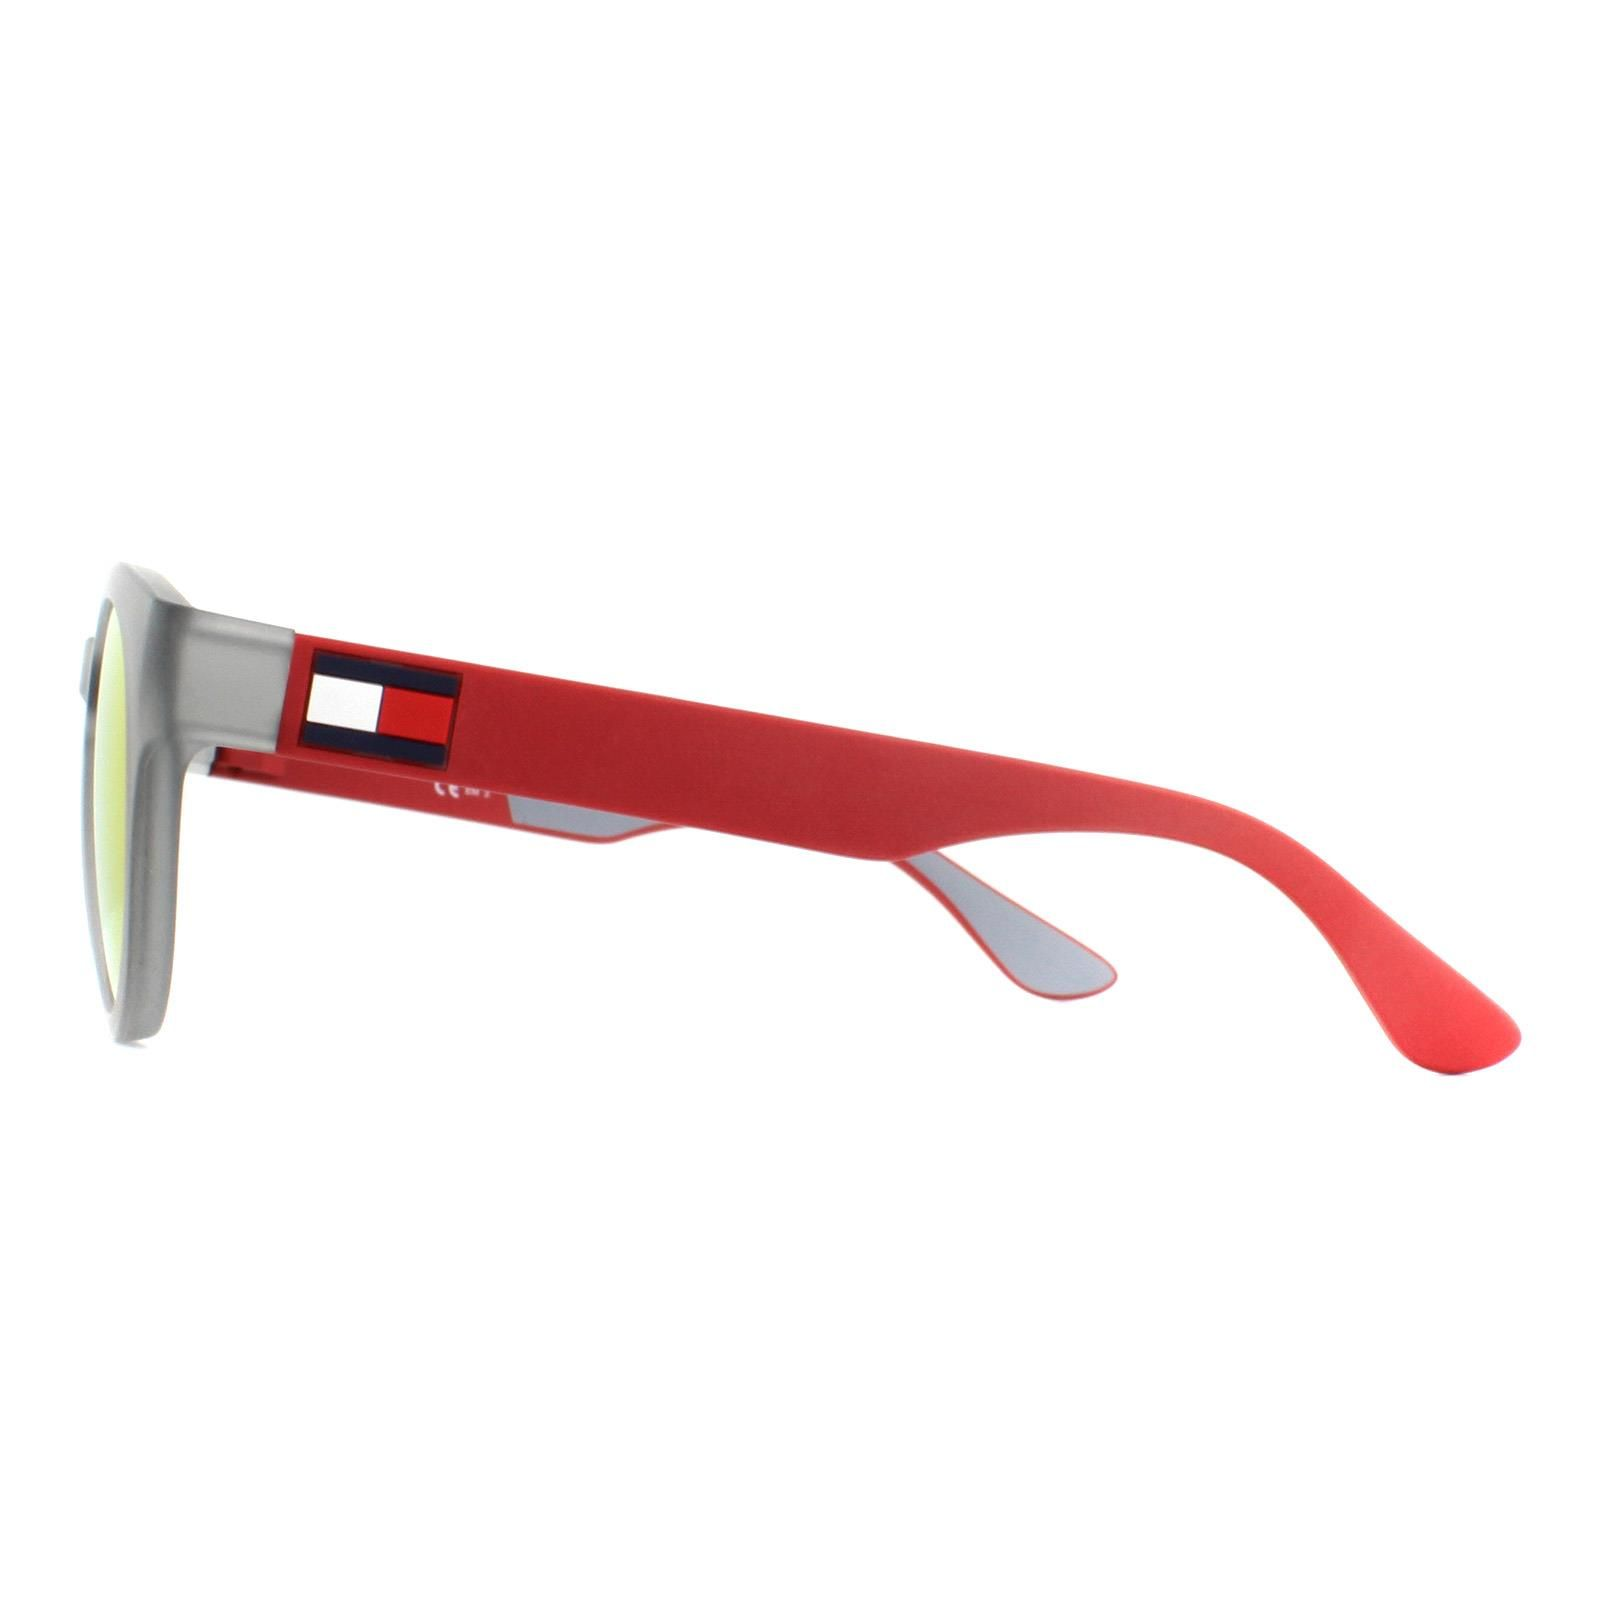 Tommy Hilfiger Sunglasses Th 1555/S Fre Uz Matte Grey Red Mirror